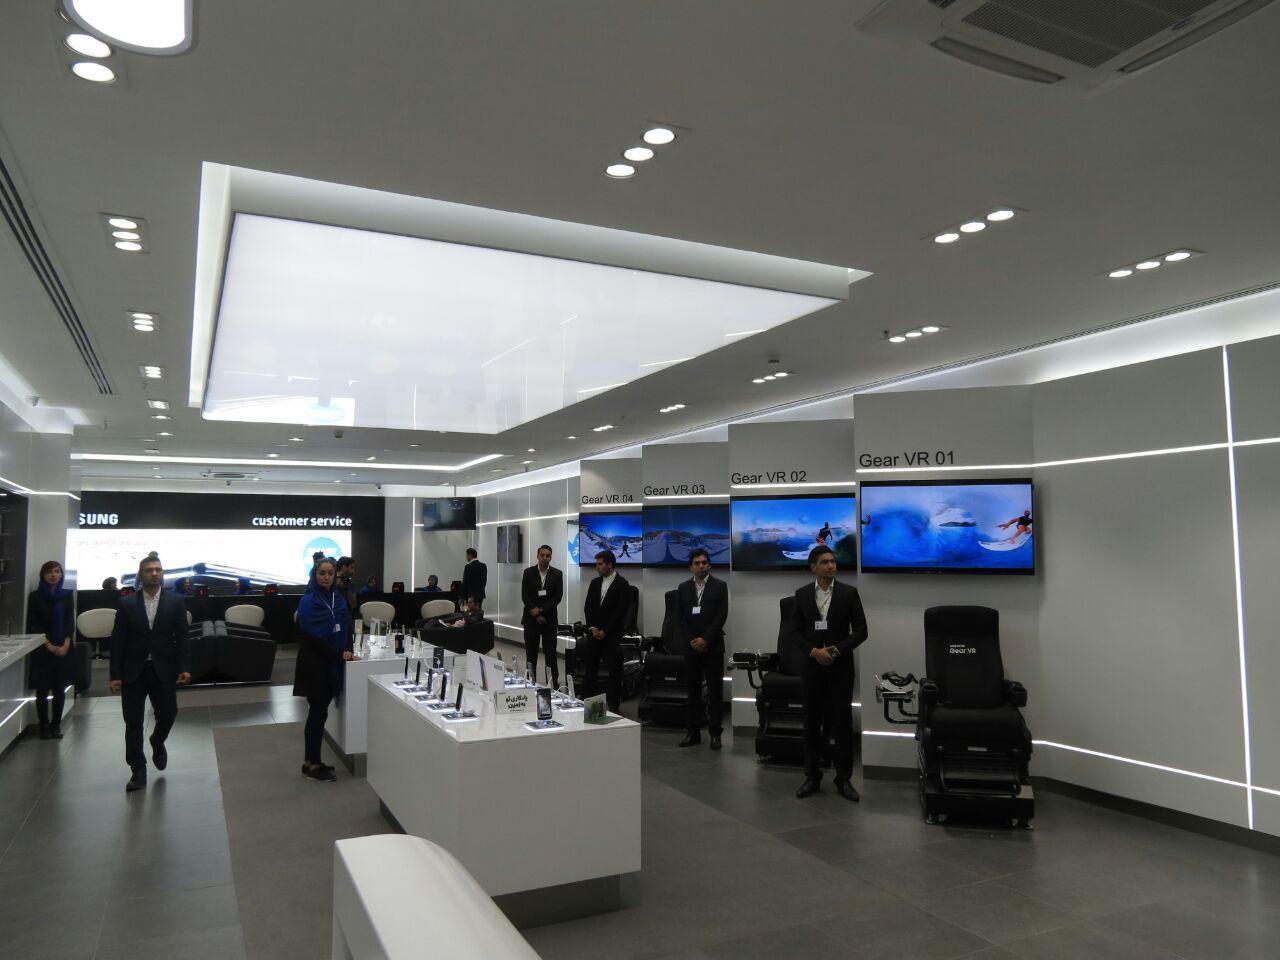 samsung-new-service-center-3